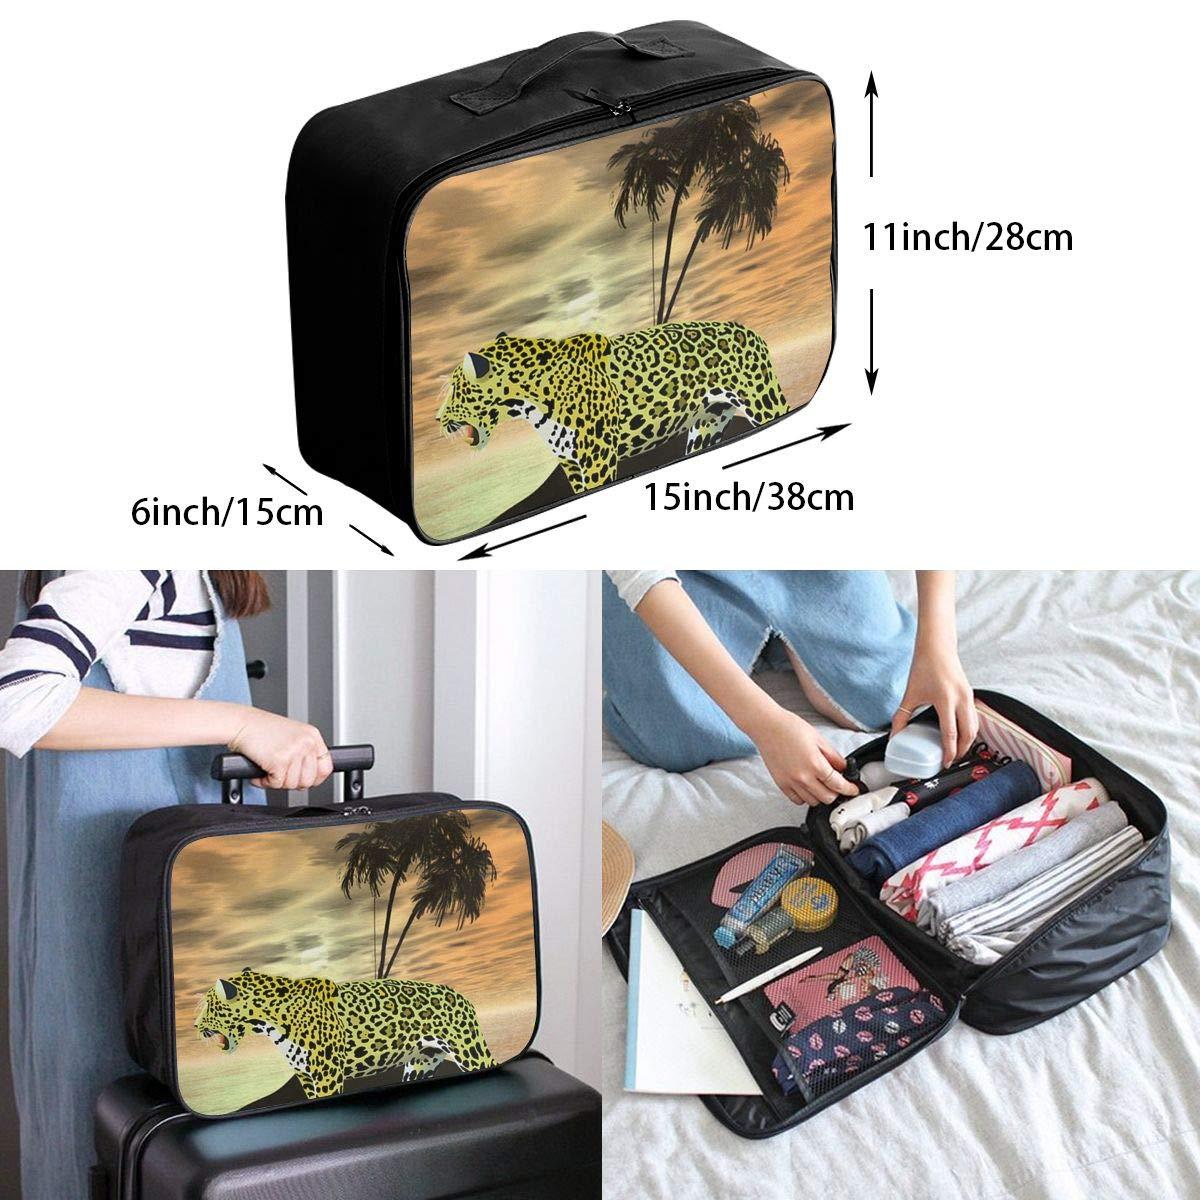 YueLJB Leopard Island Lightweight Large Capacity Portable Luggage Bag Travel Duffel Bag Storage Carry Luggage Duffle Tote Bag